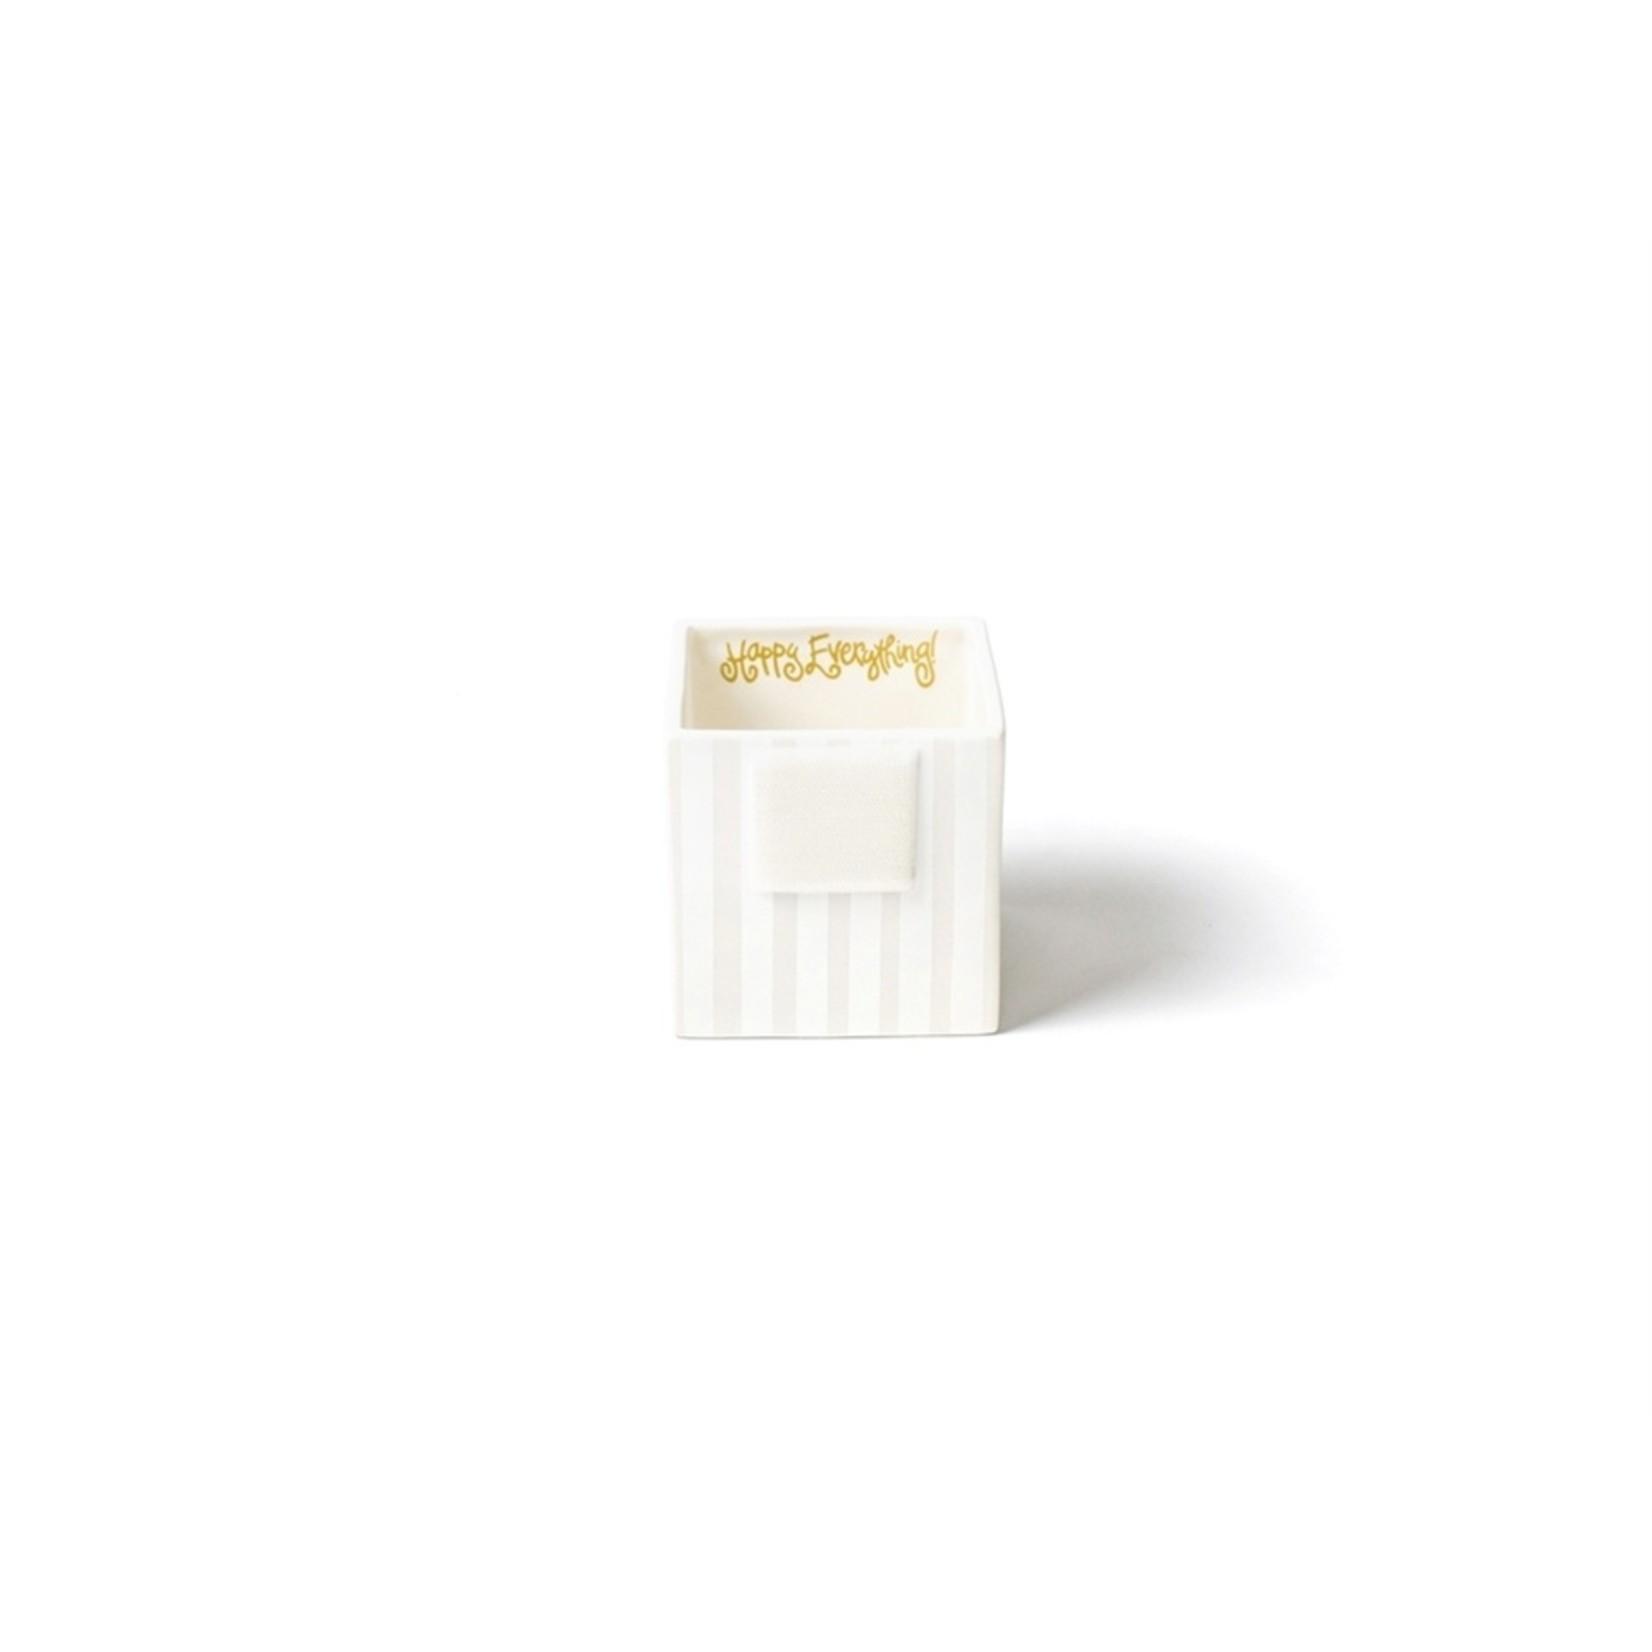 Happy Everything White Stripe Mini Nesting Cube Small